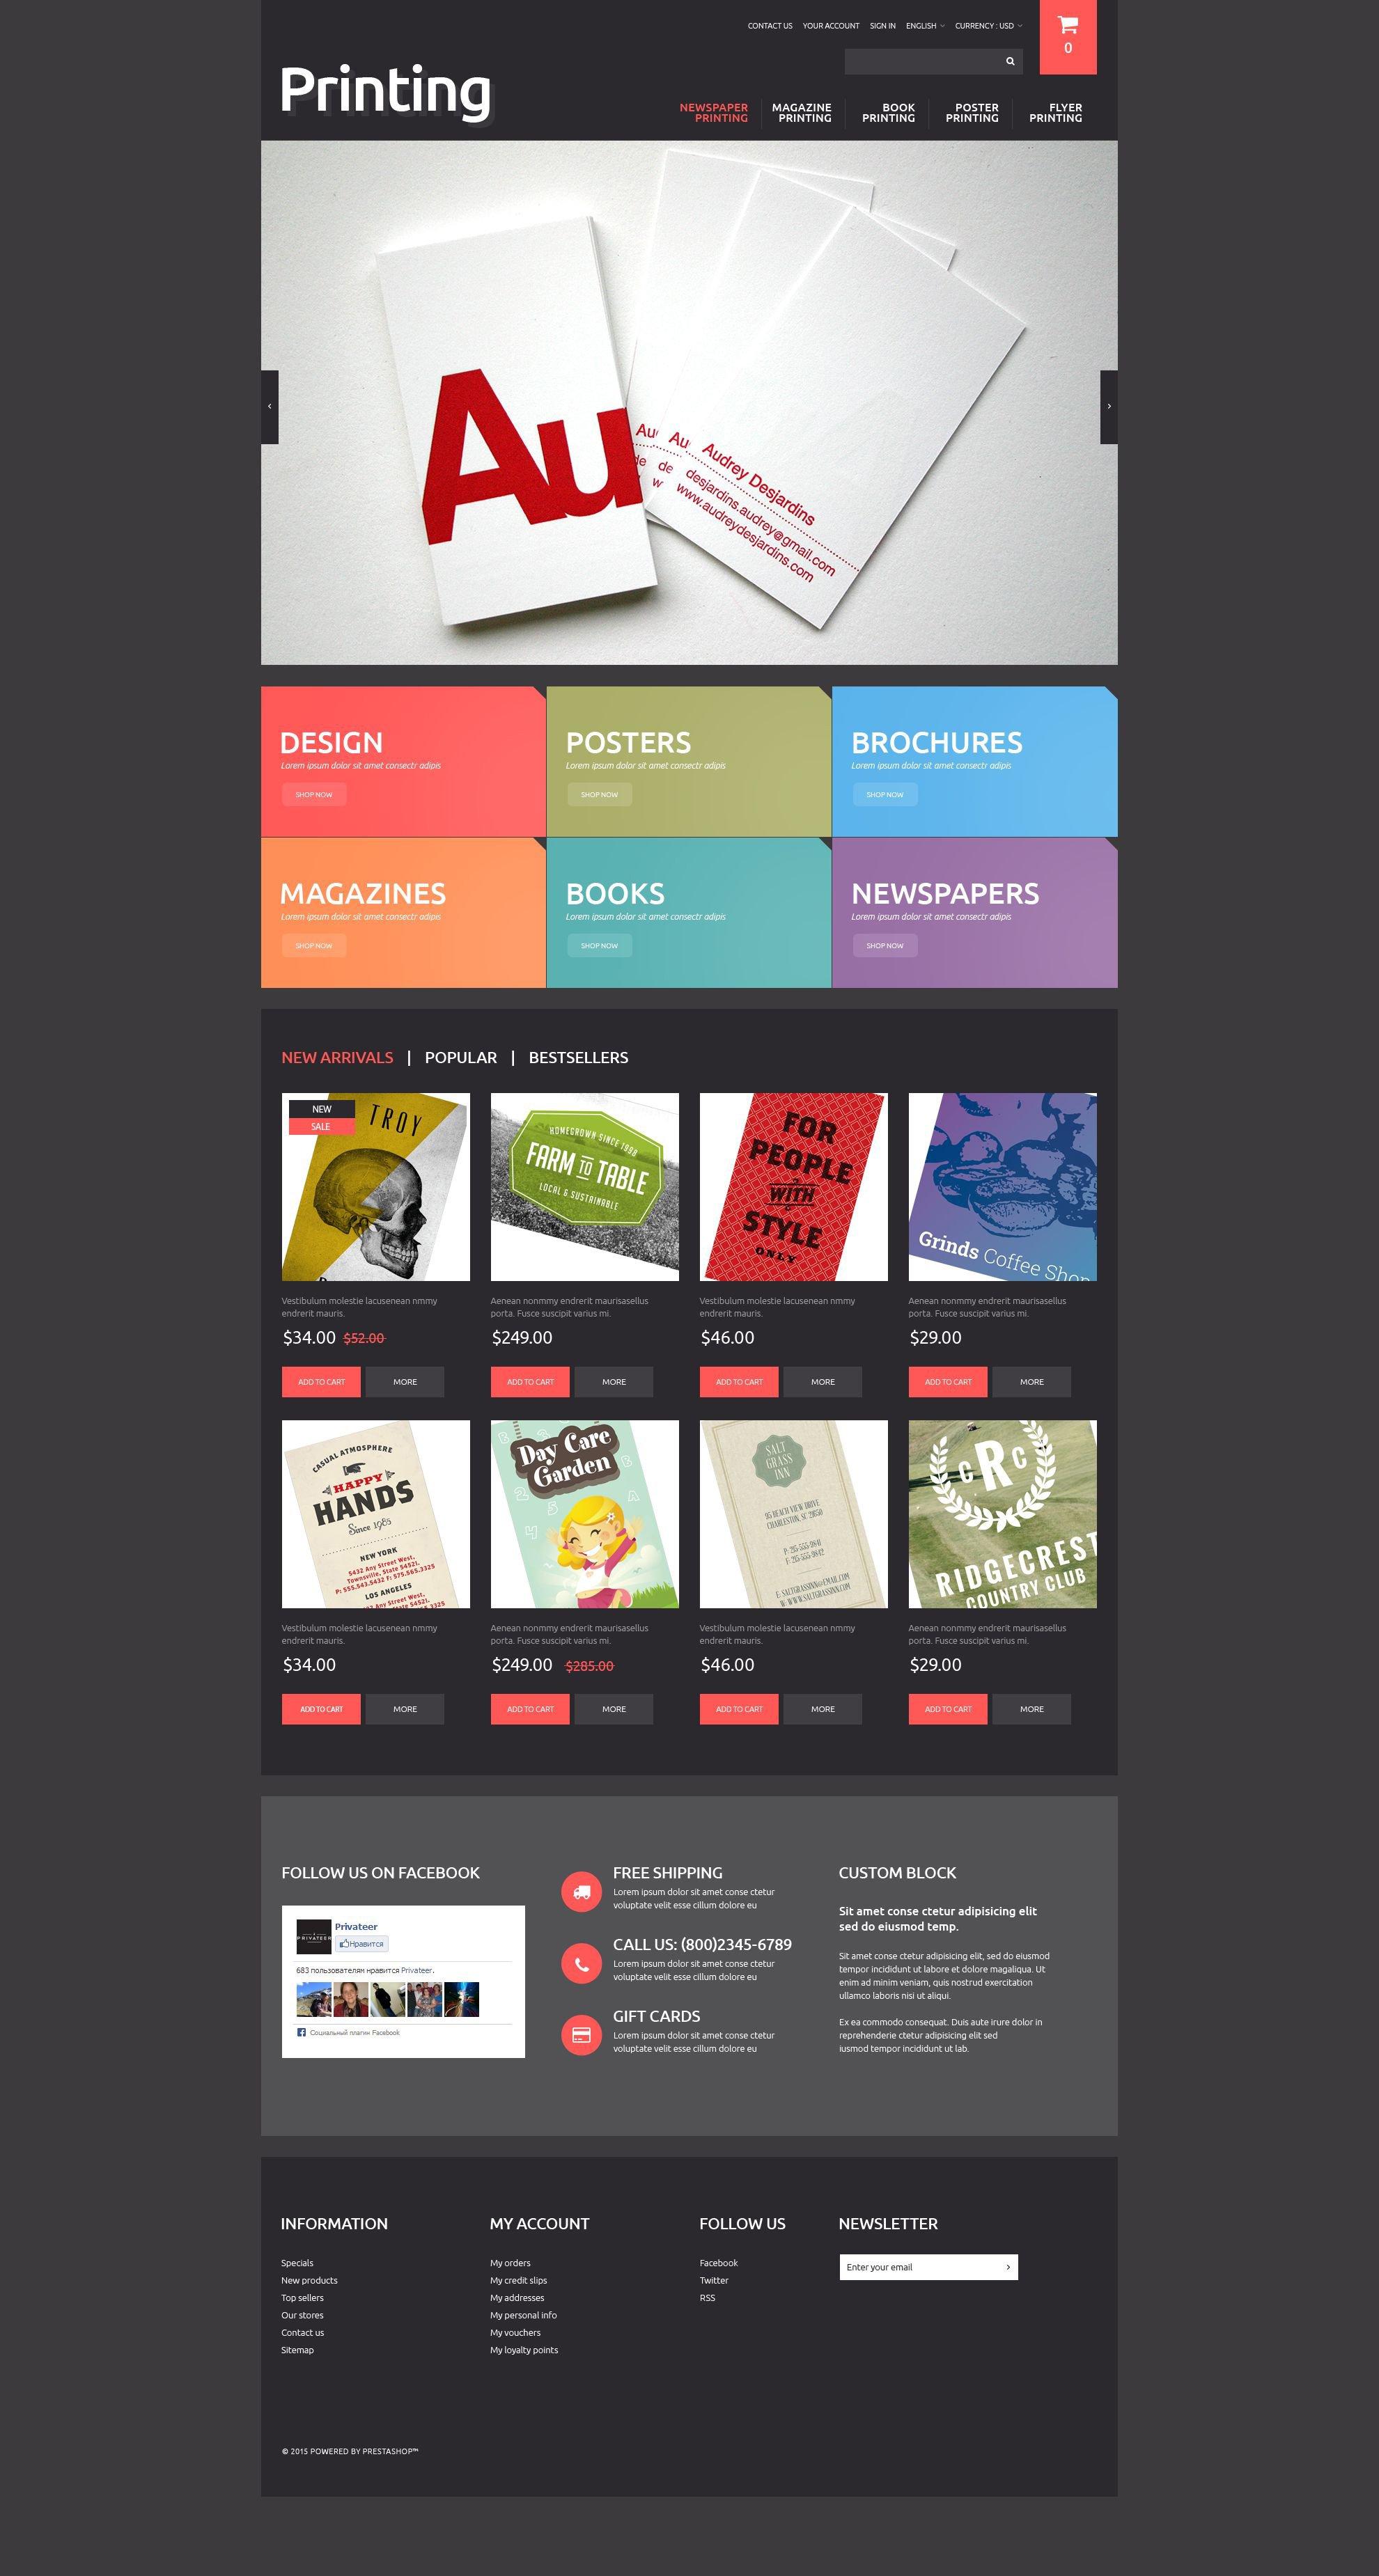 Printing Solutions PrestaShop Theme - Dreamweaver ebay template